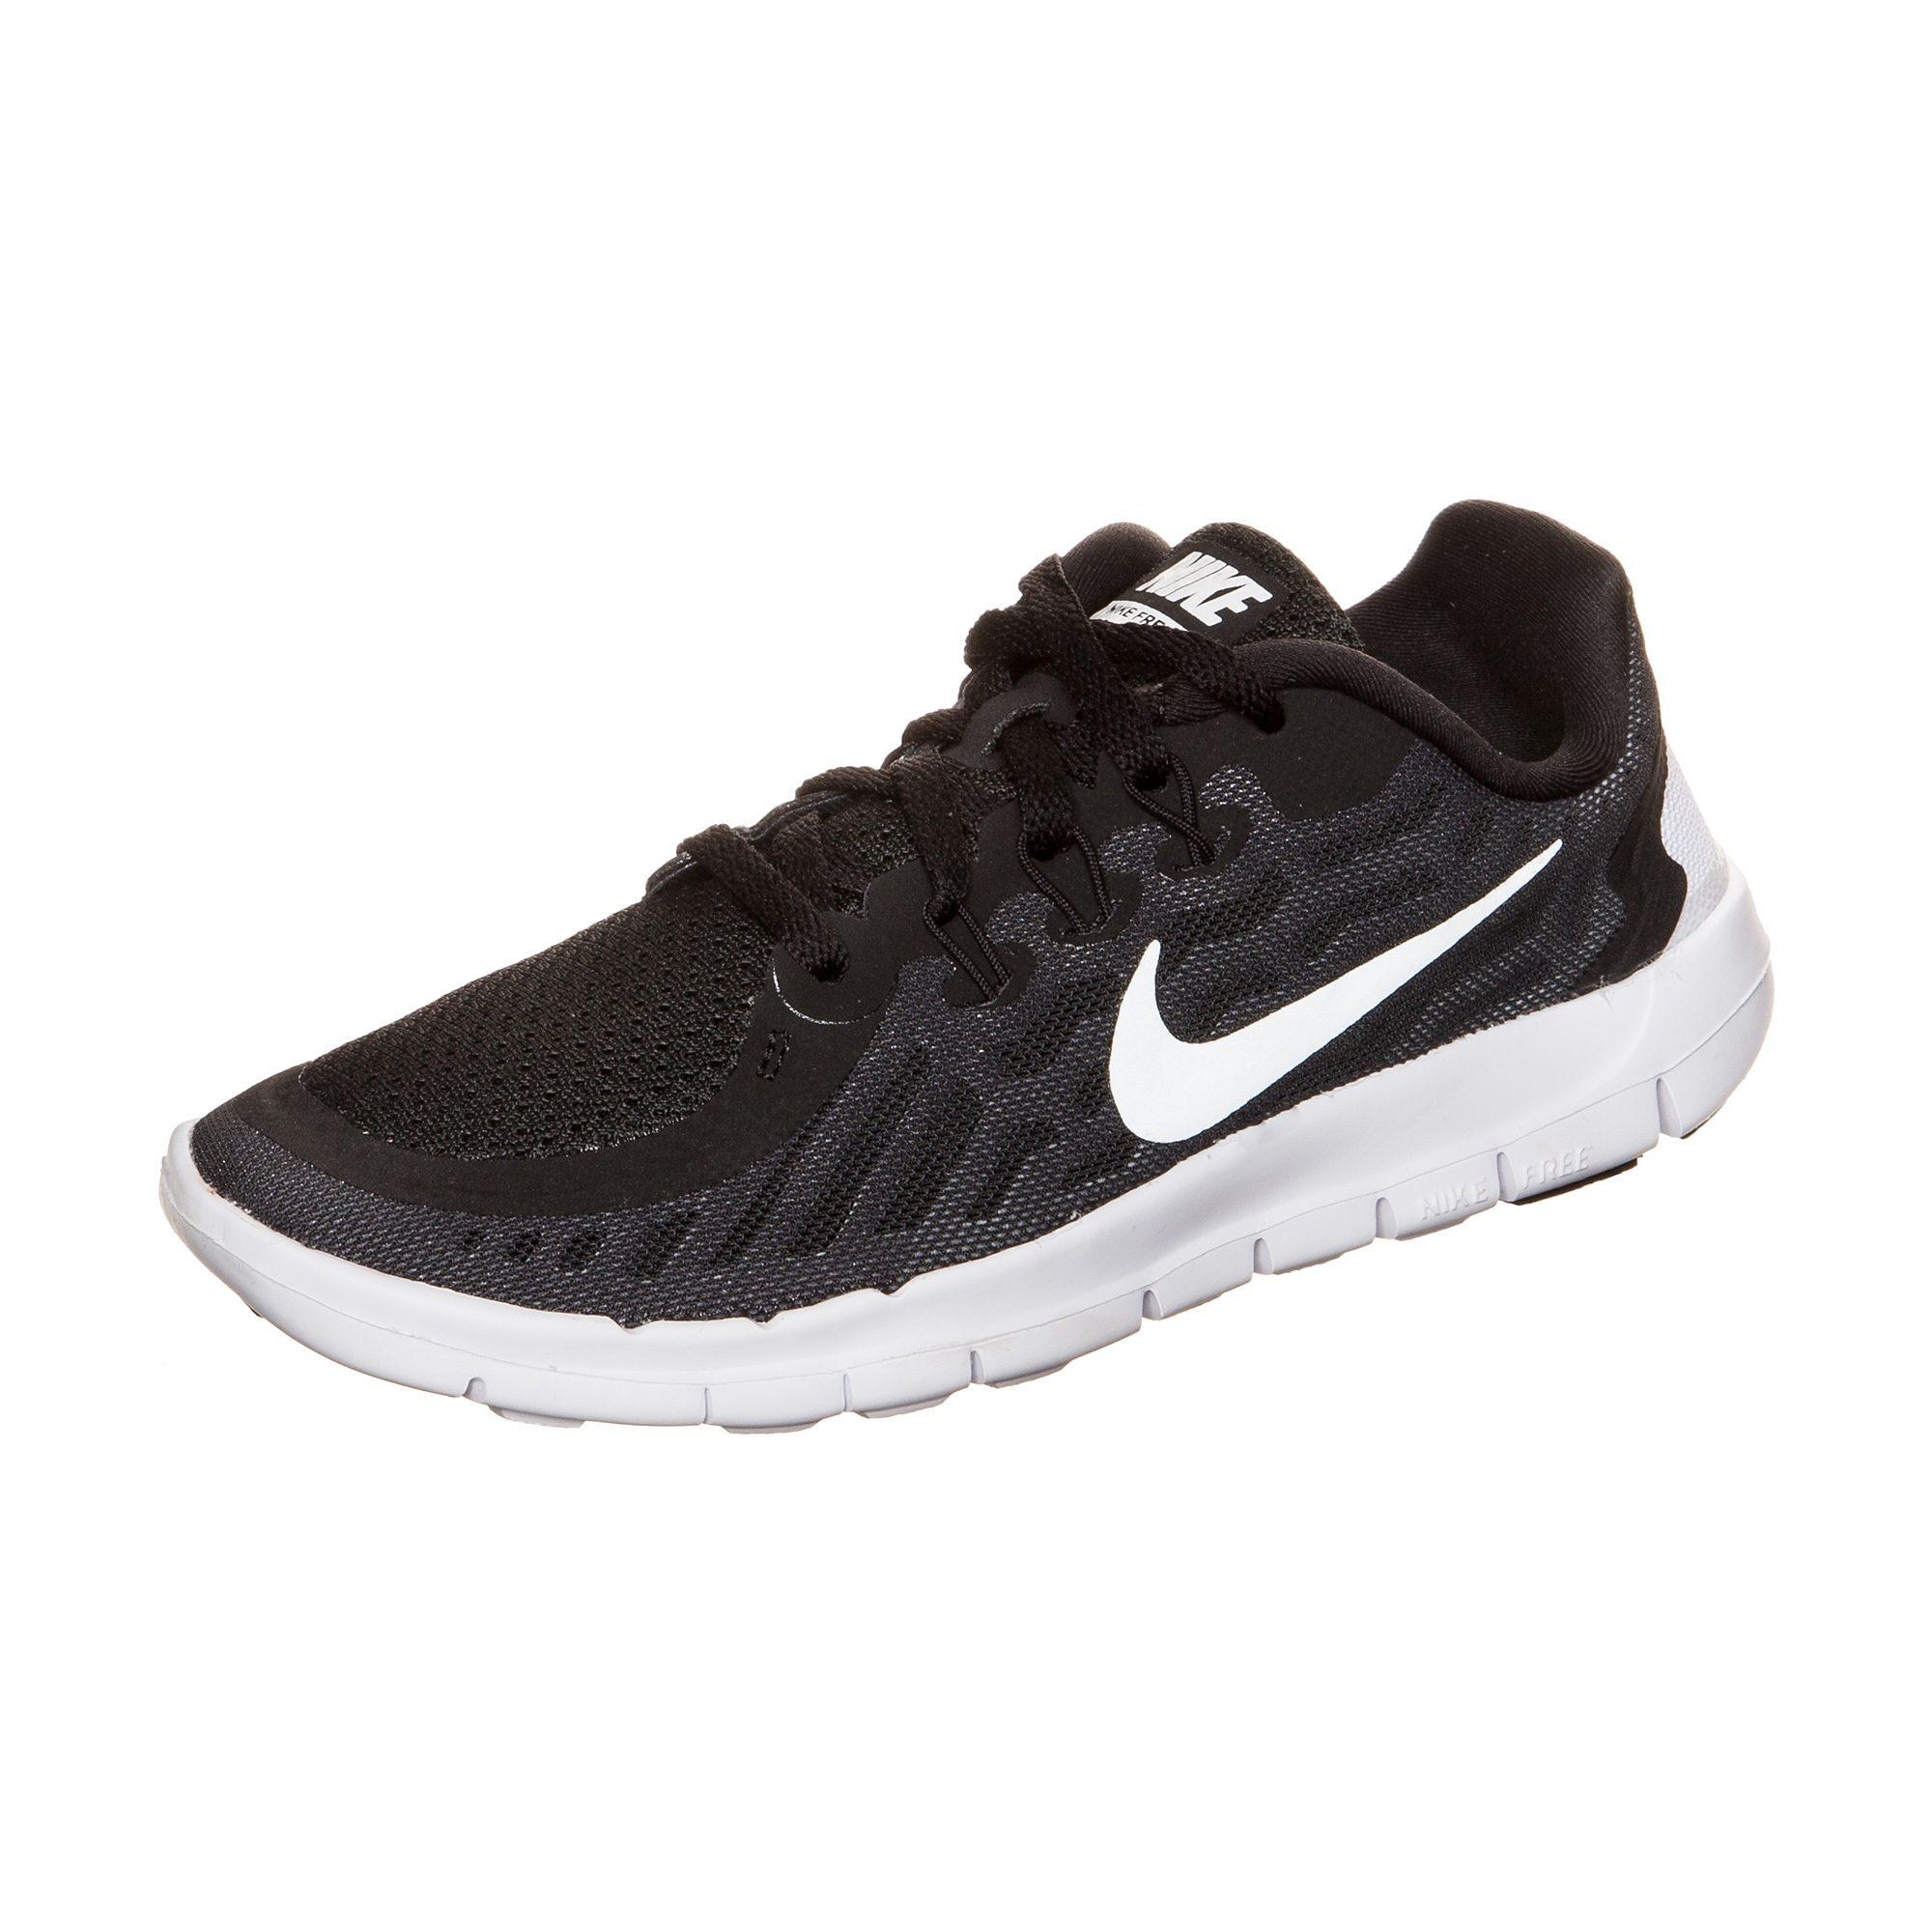 Nike Free 5.0 (GS) 644446 001 Black & Pink Running Shoes for GirlsWomen